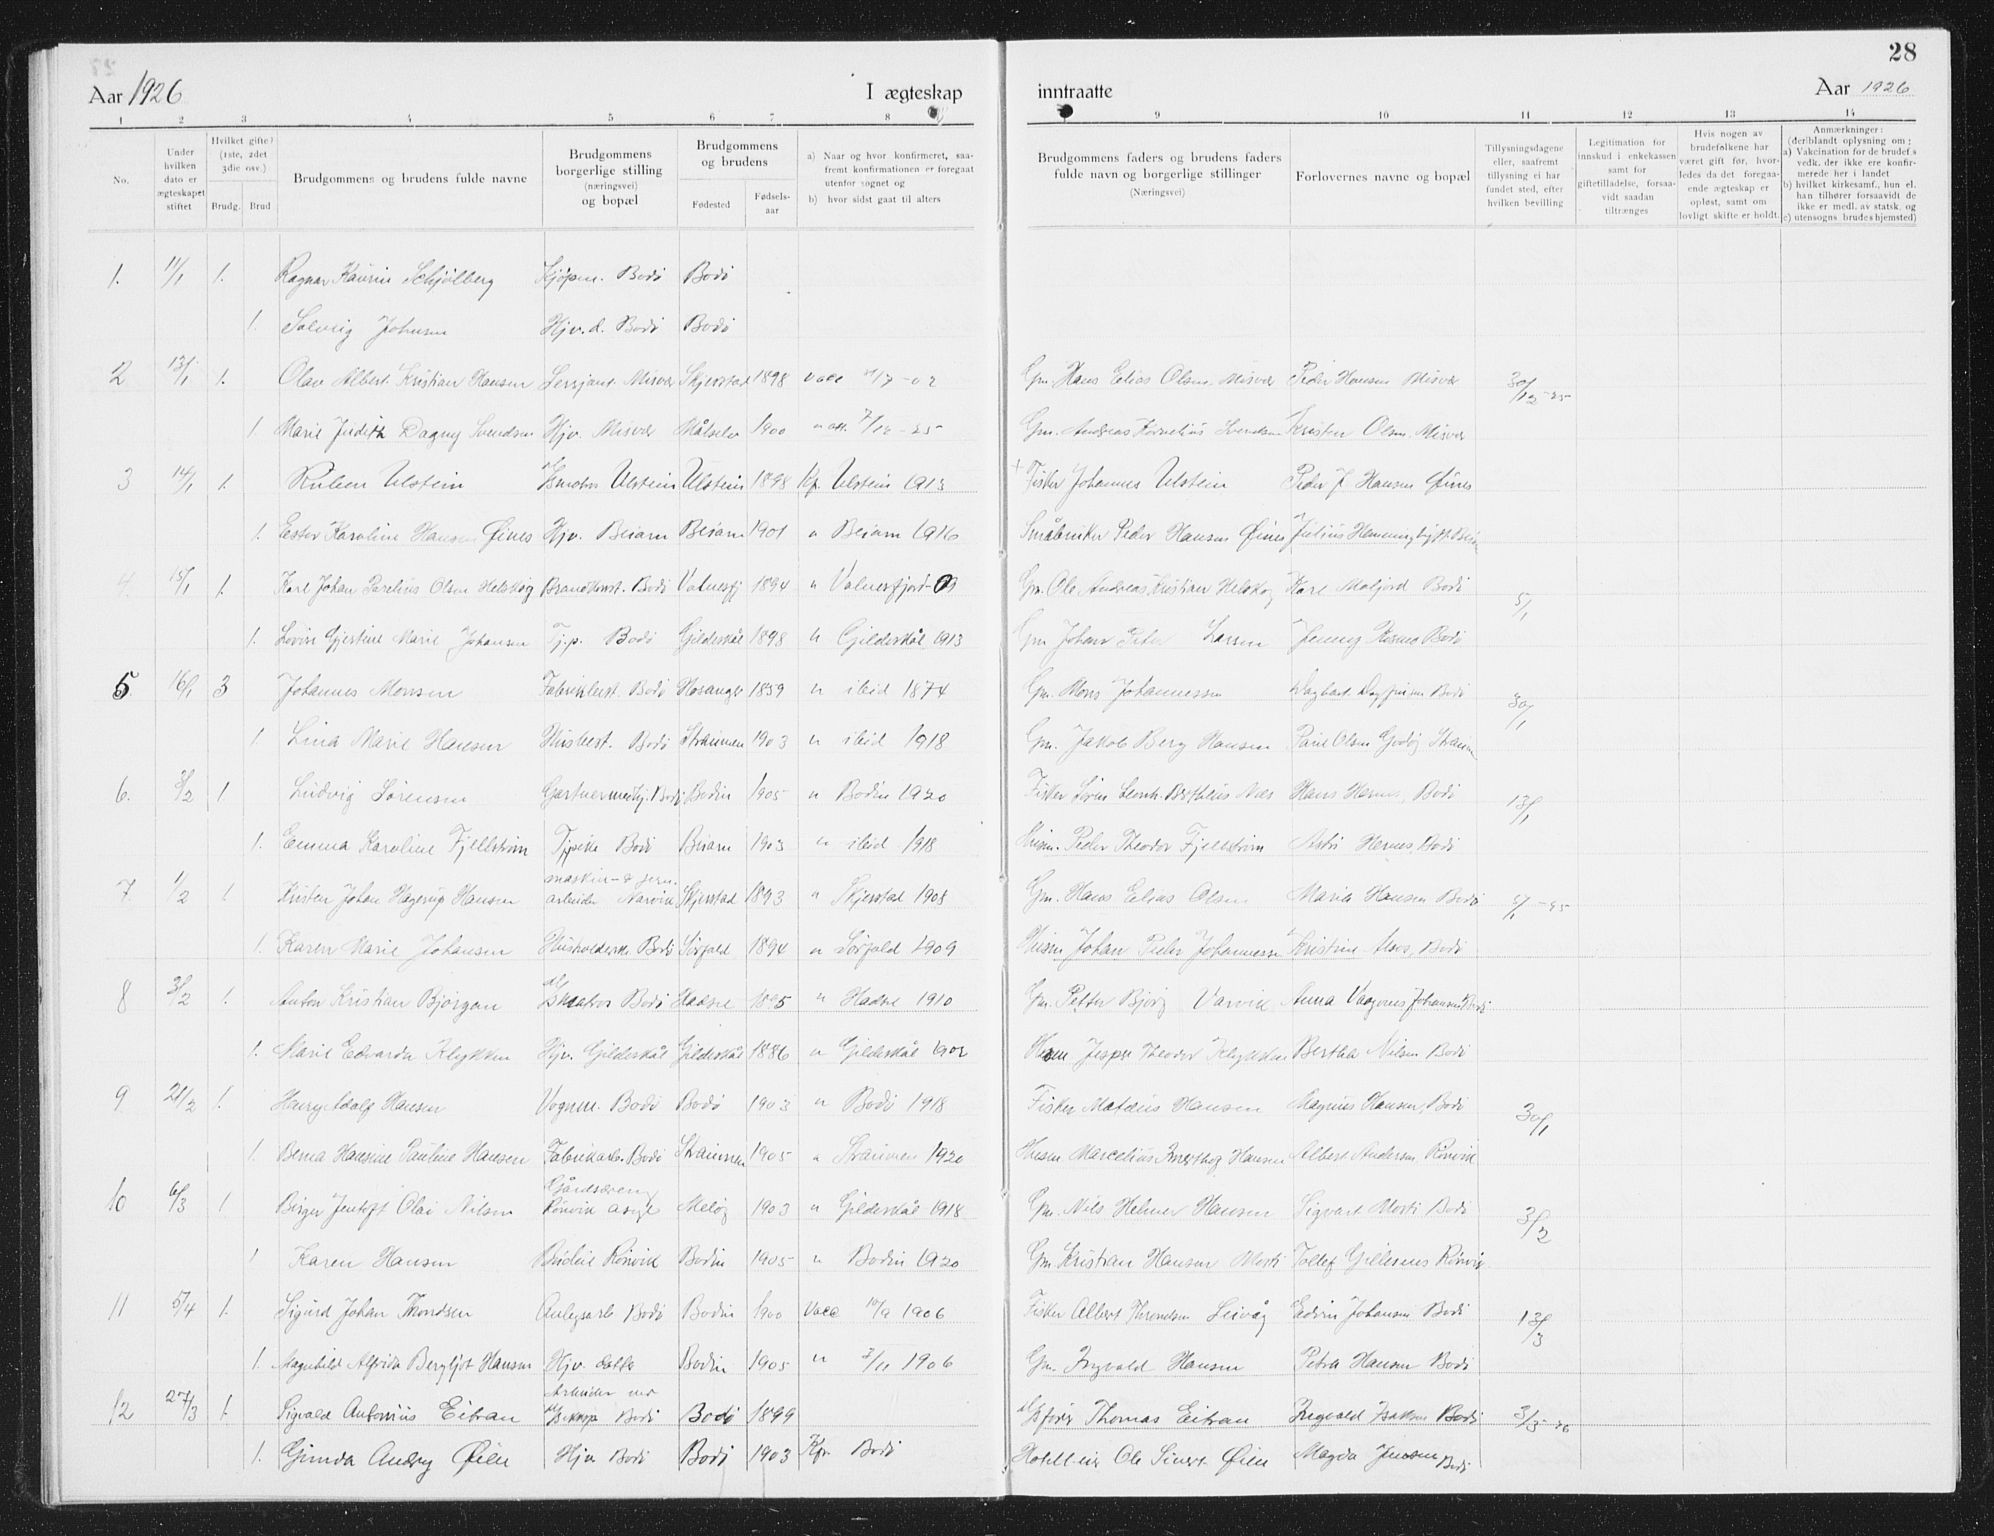 SAT, Ministerialprotokoller, klokkerbøker og fødselsregistre - Nordland, 801/L0036: Klokkerbok nr. 801C11, 1920-1934, s. 28